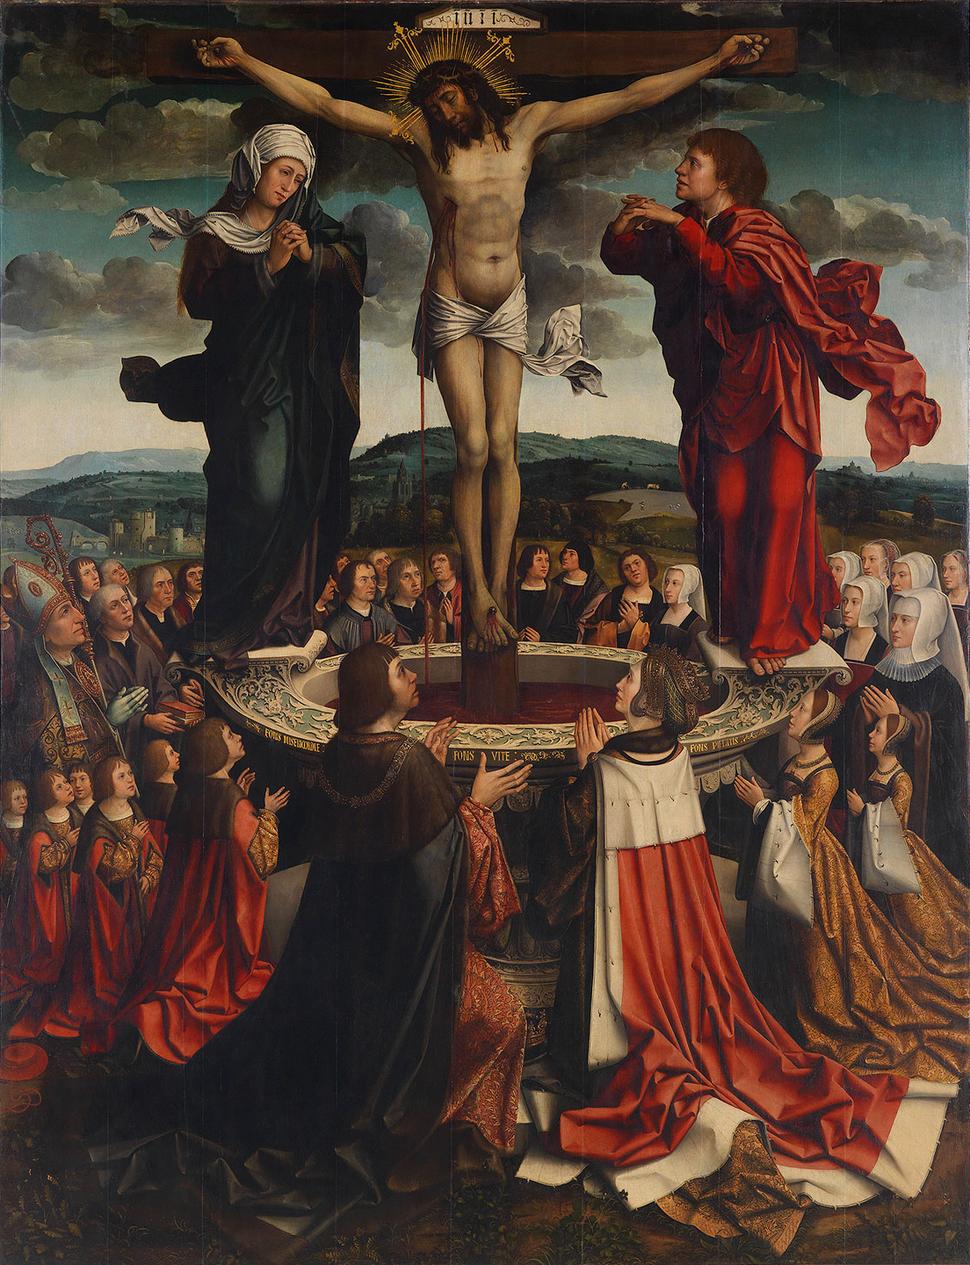 Fons Vitae (c. 1515-1517) - Colijn de Coter (attributed)